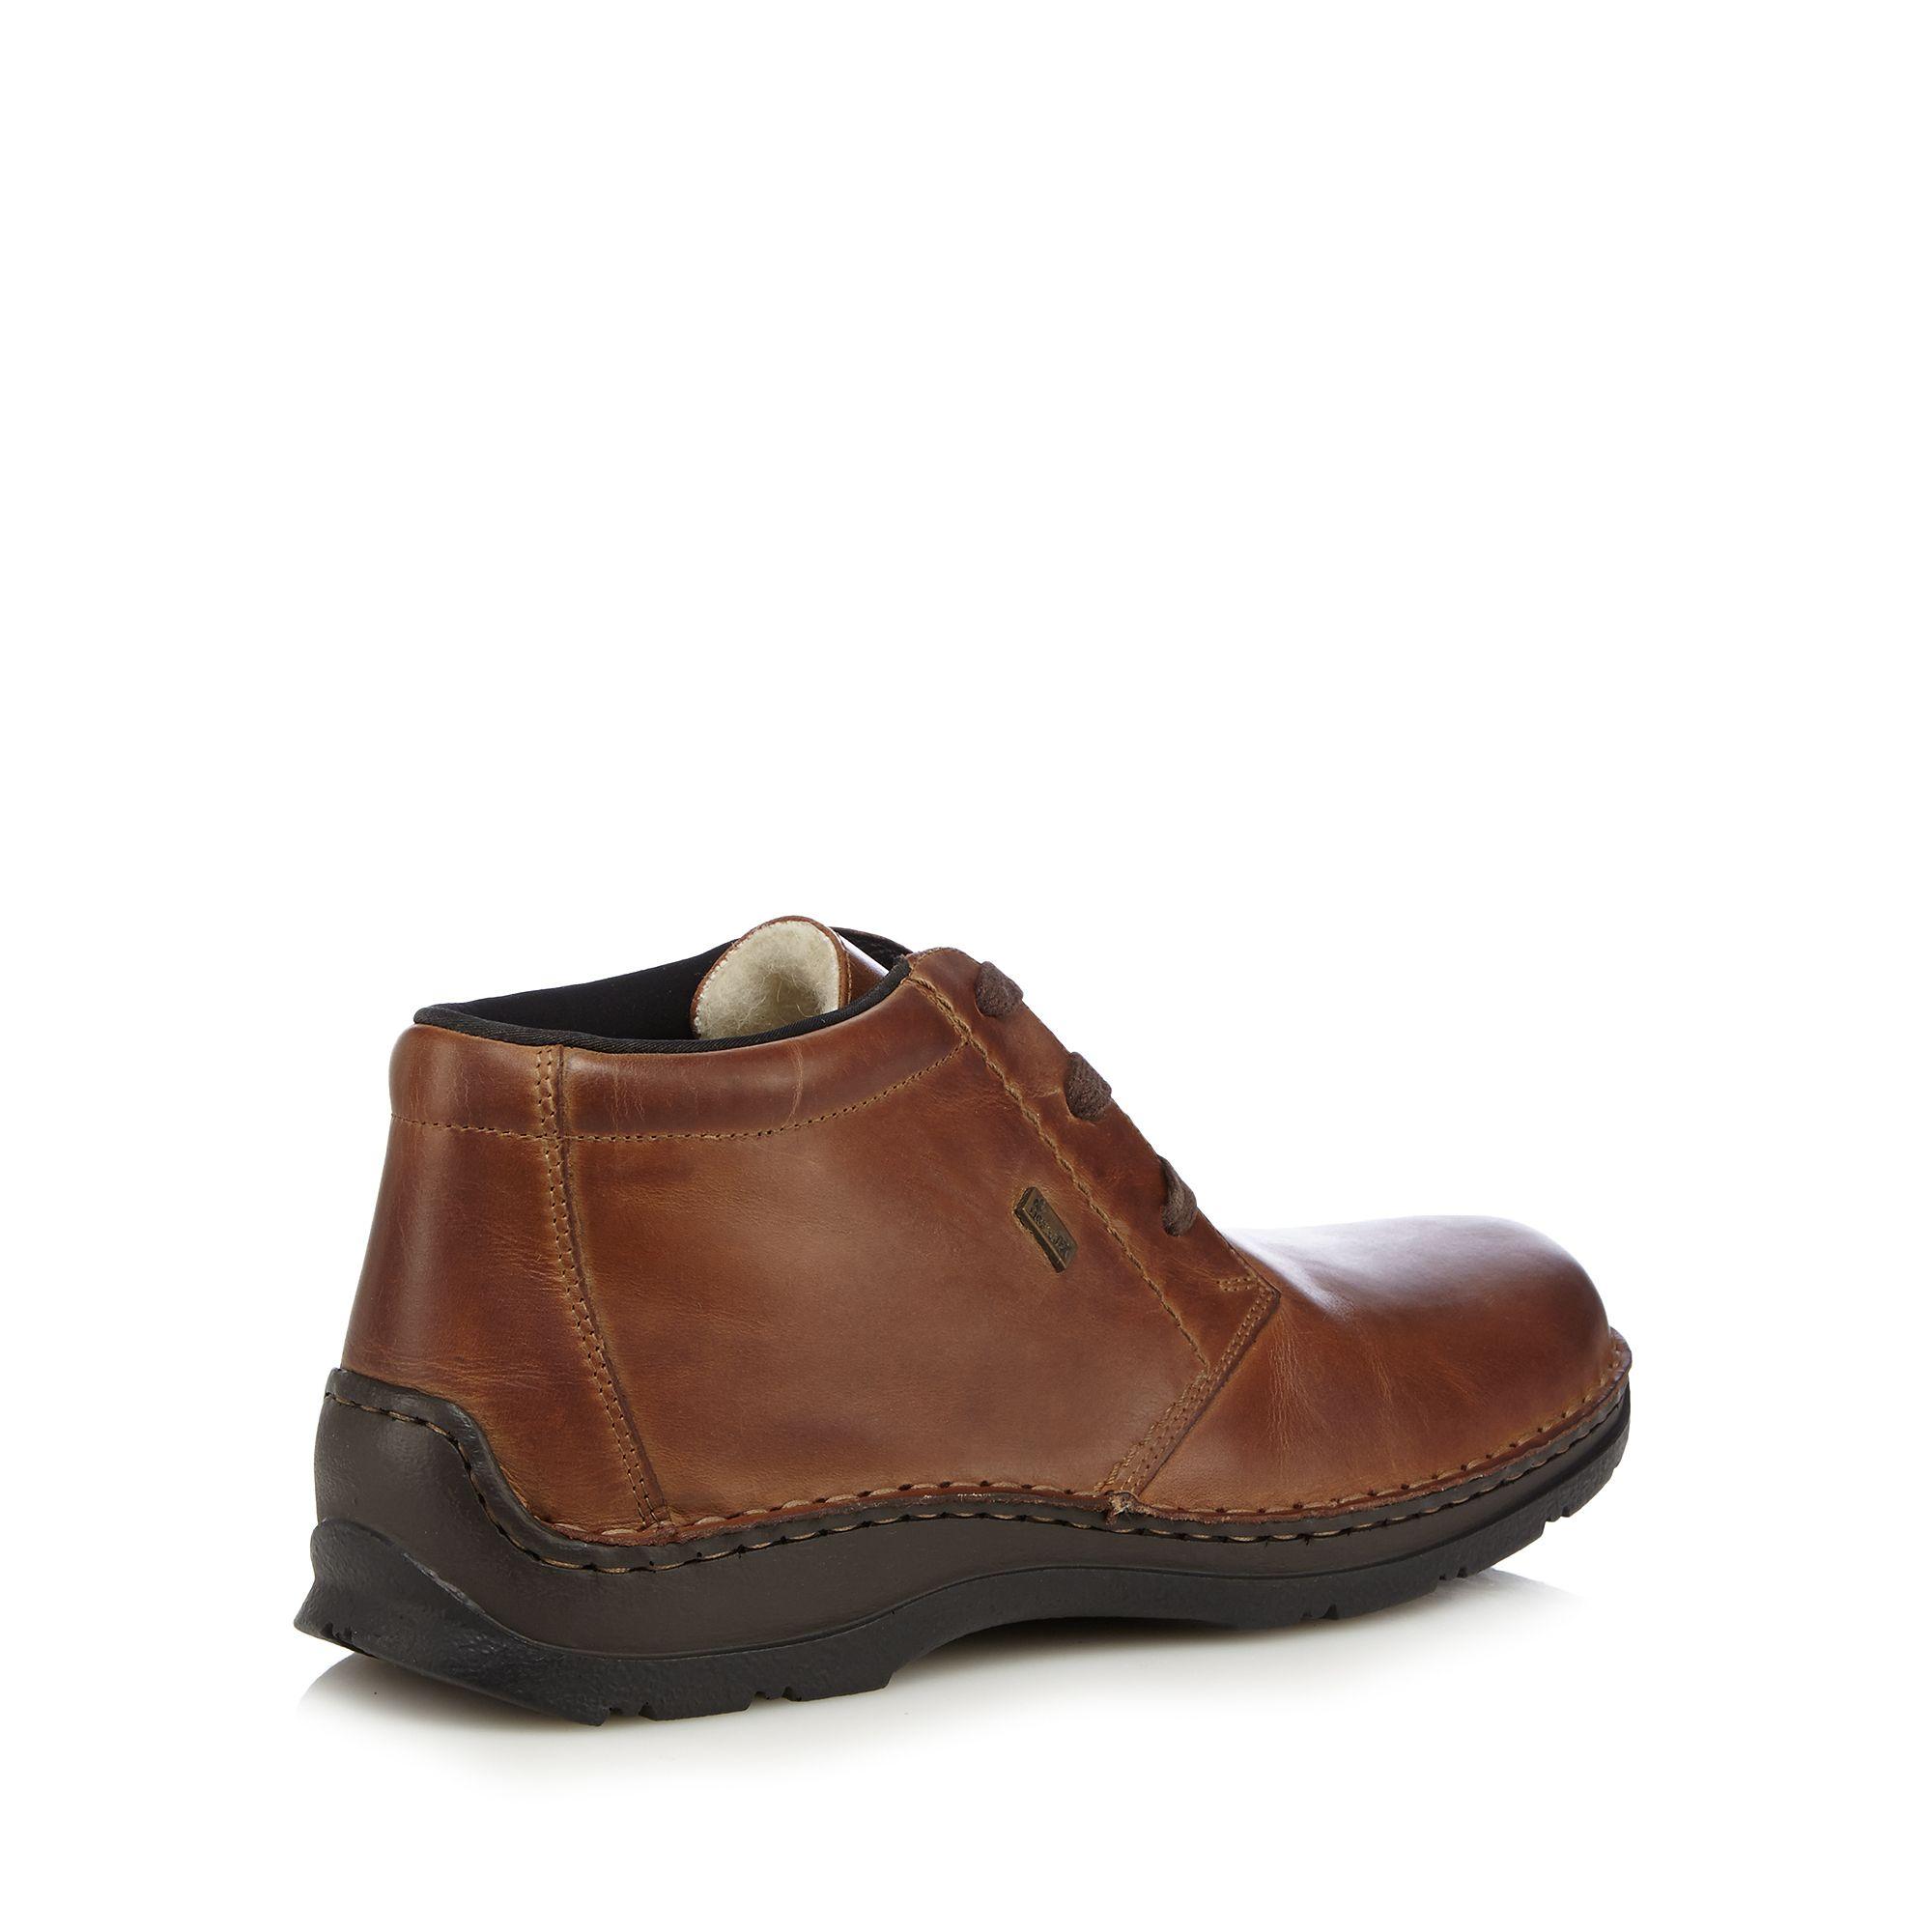 rieker mens brown leather apron boots from debenhams ebay